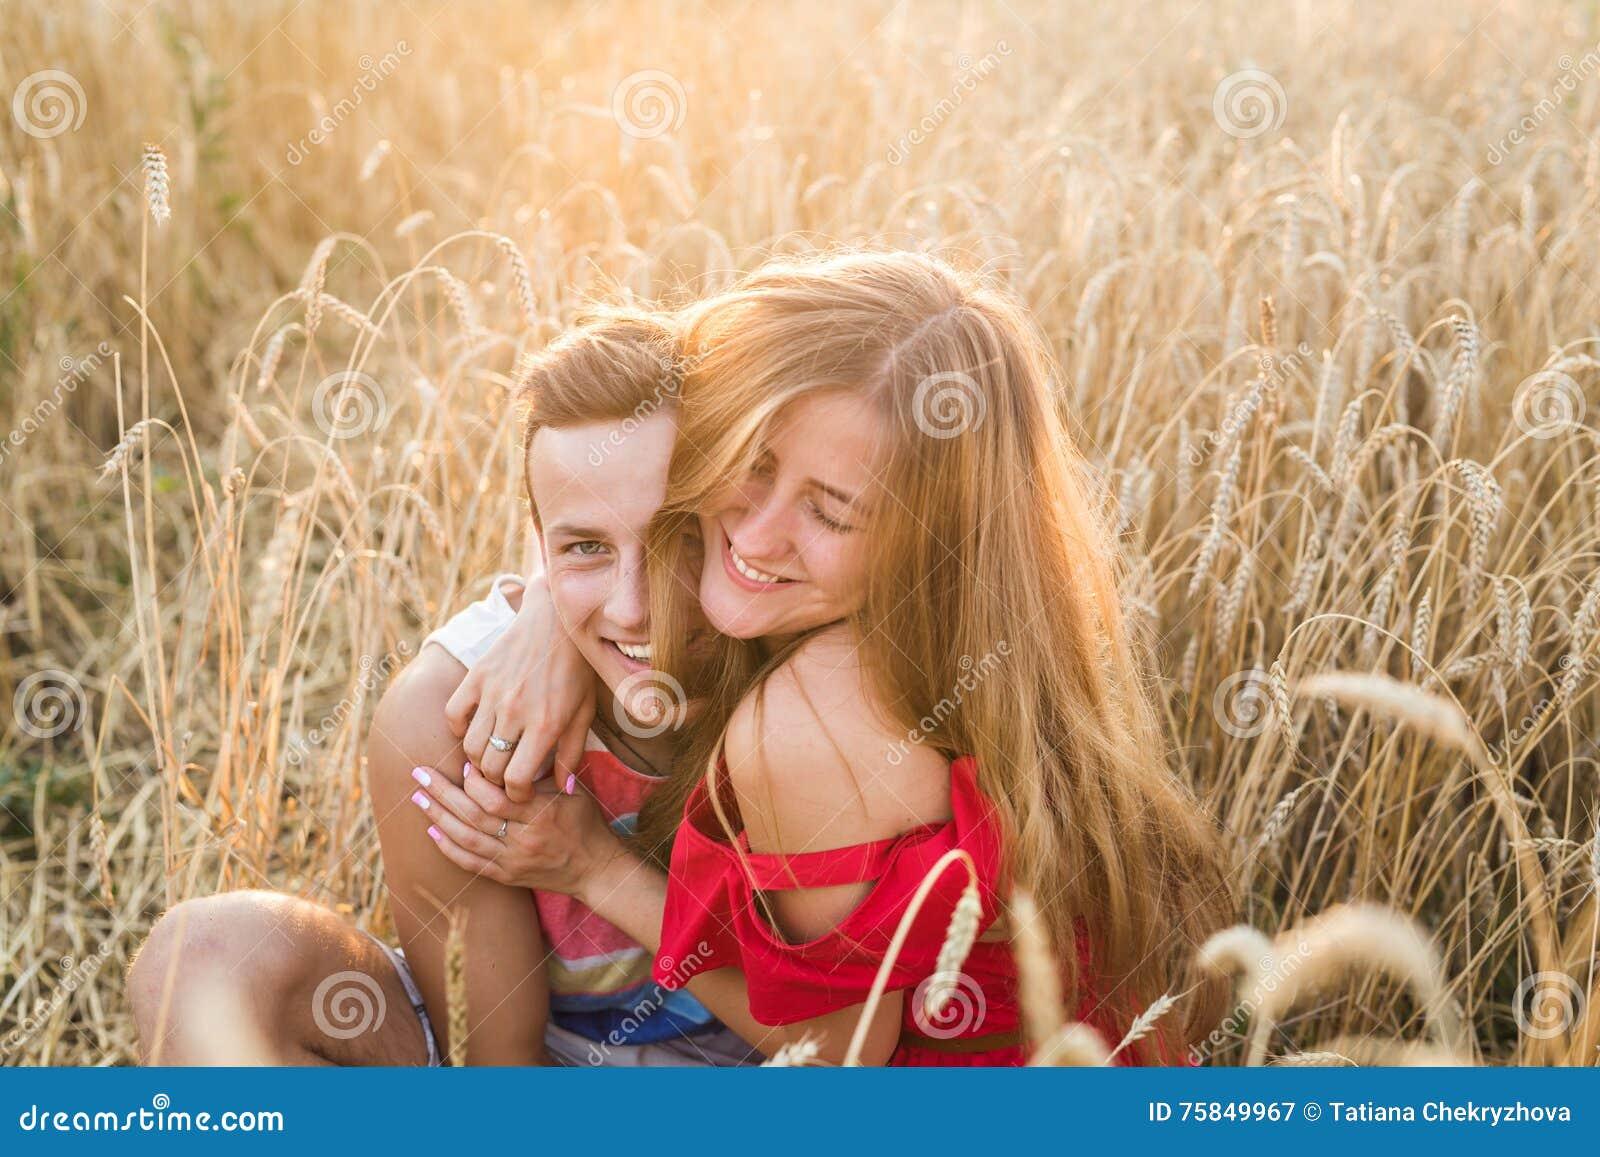 Teenage Girlfriend And Boyfriend Having Fun Outdoors Kissing